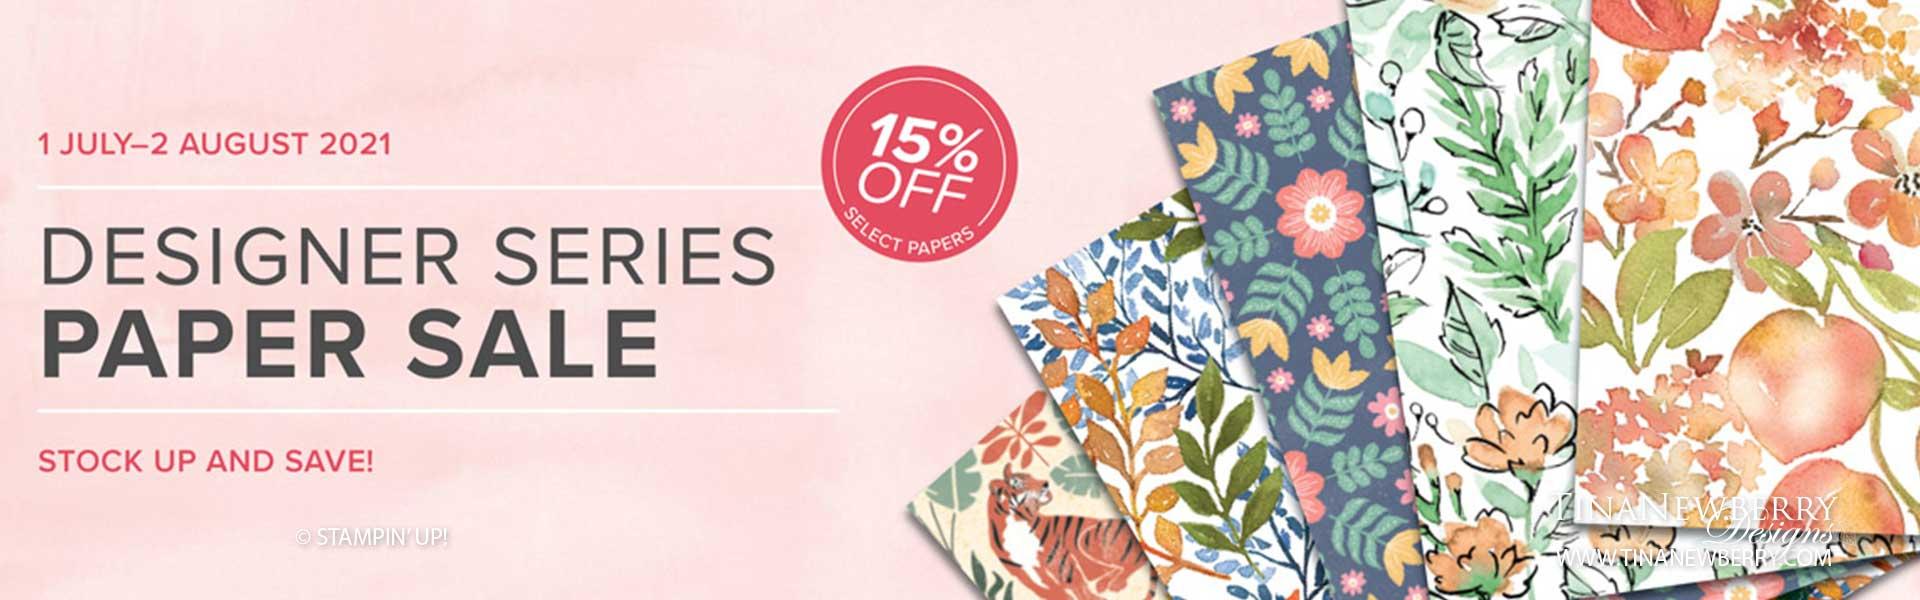 Save 15% on Designer Series Paper